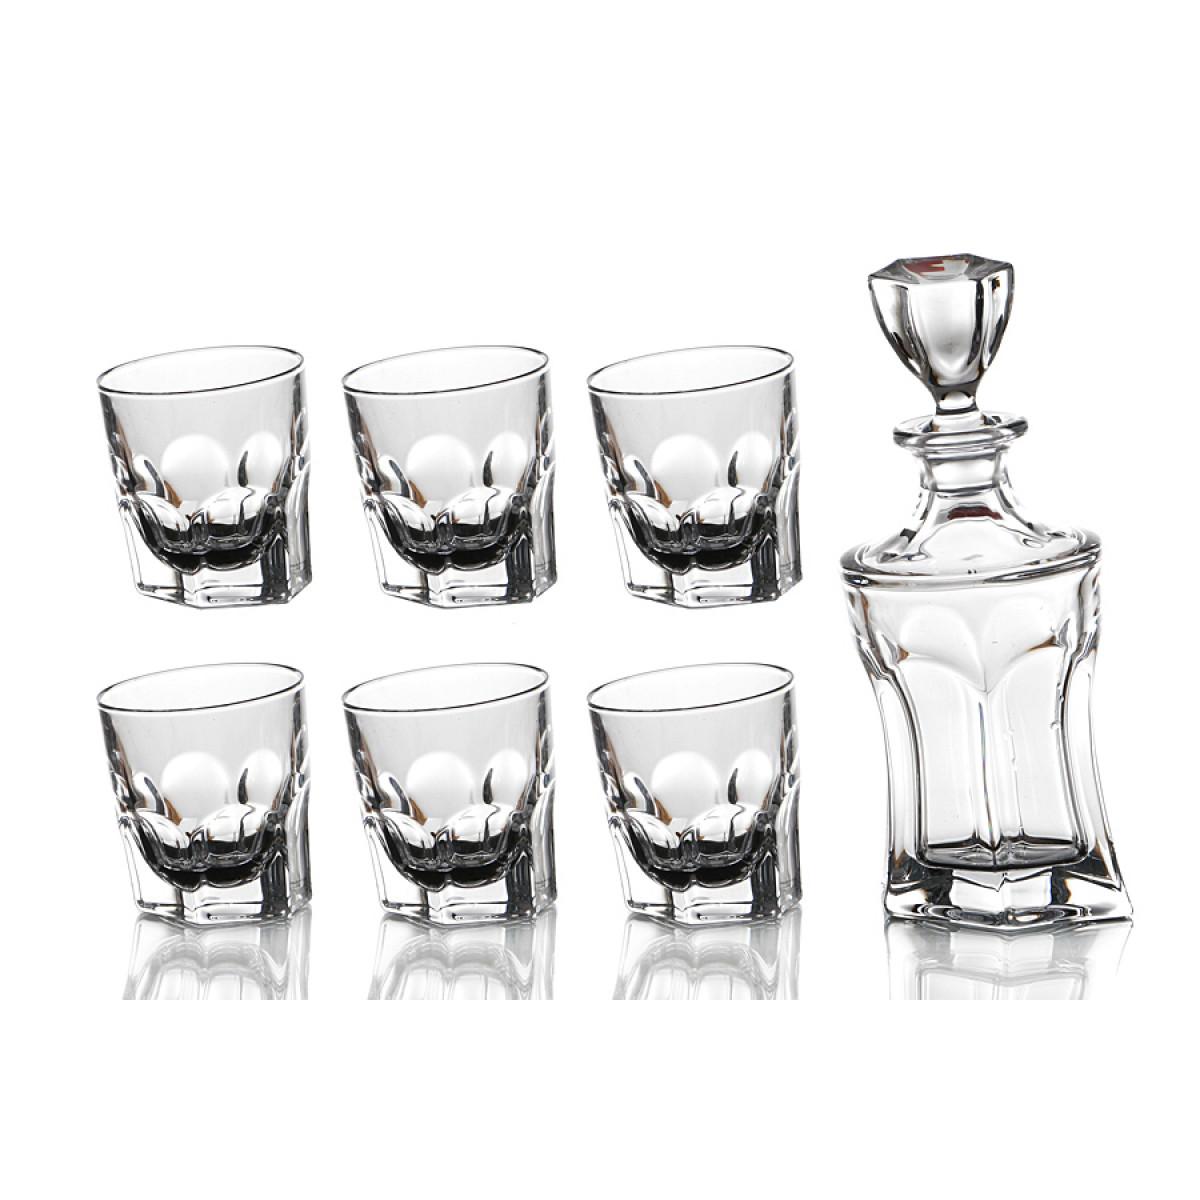 {} Crystalite Bohemia Набор для виски Kev  (Набор) набор для виски 7 предметов bohemia набор для виски 7 предметов